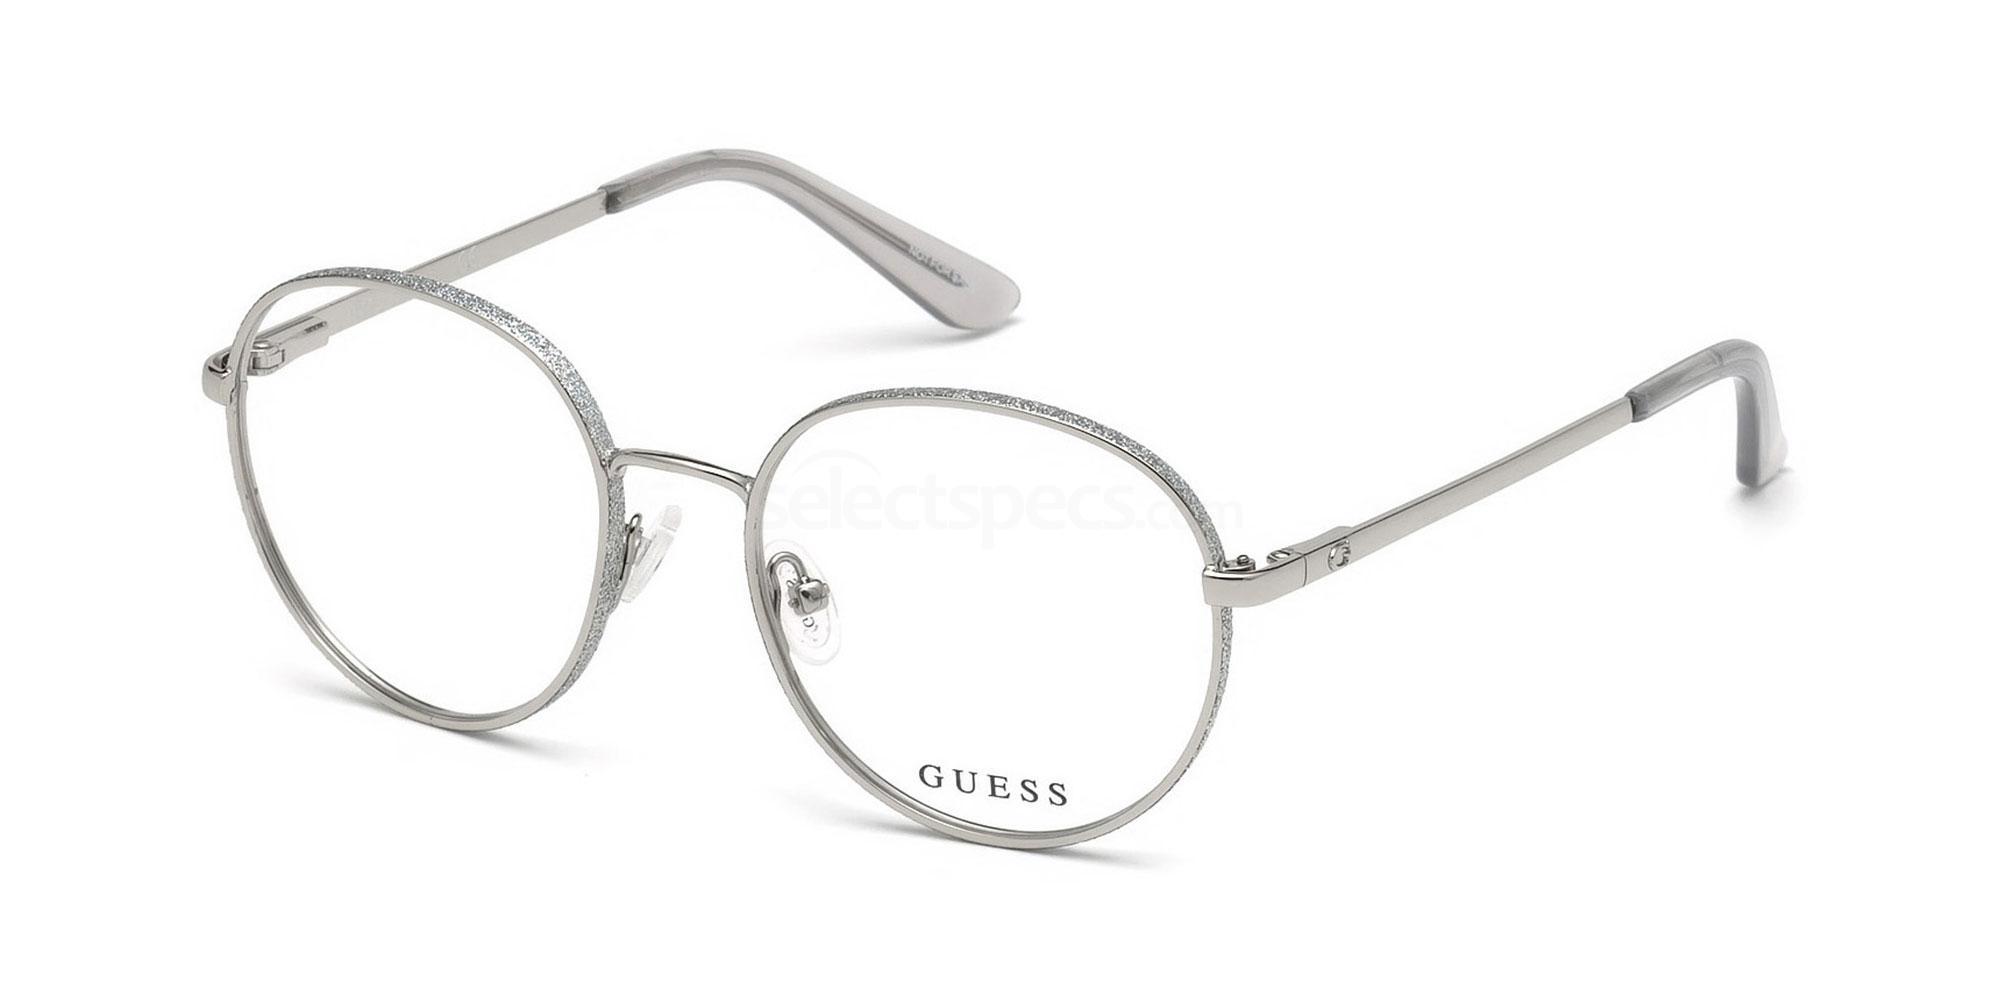 010 GU2669 Glasses, Guess